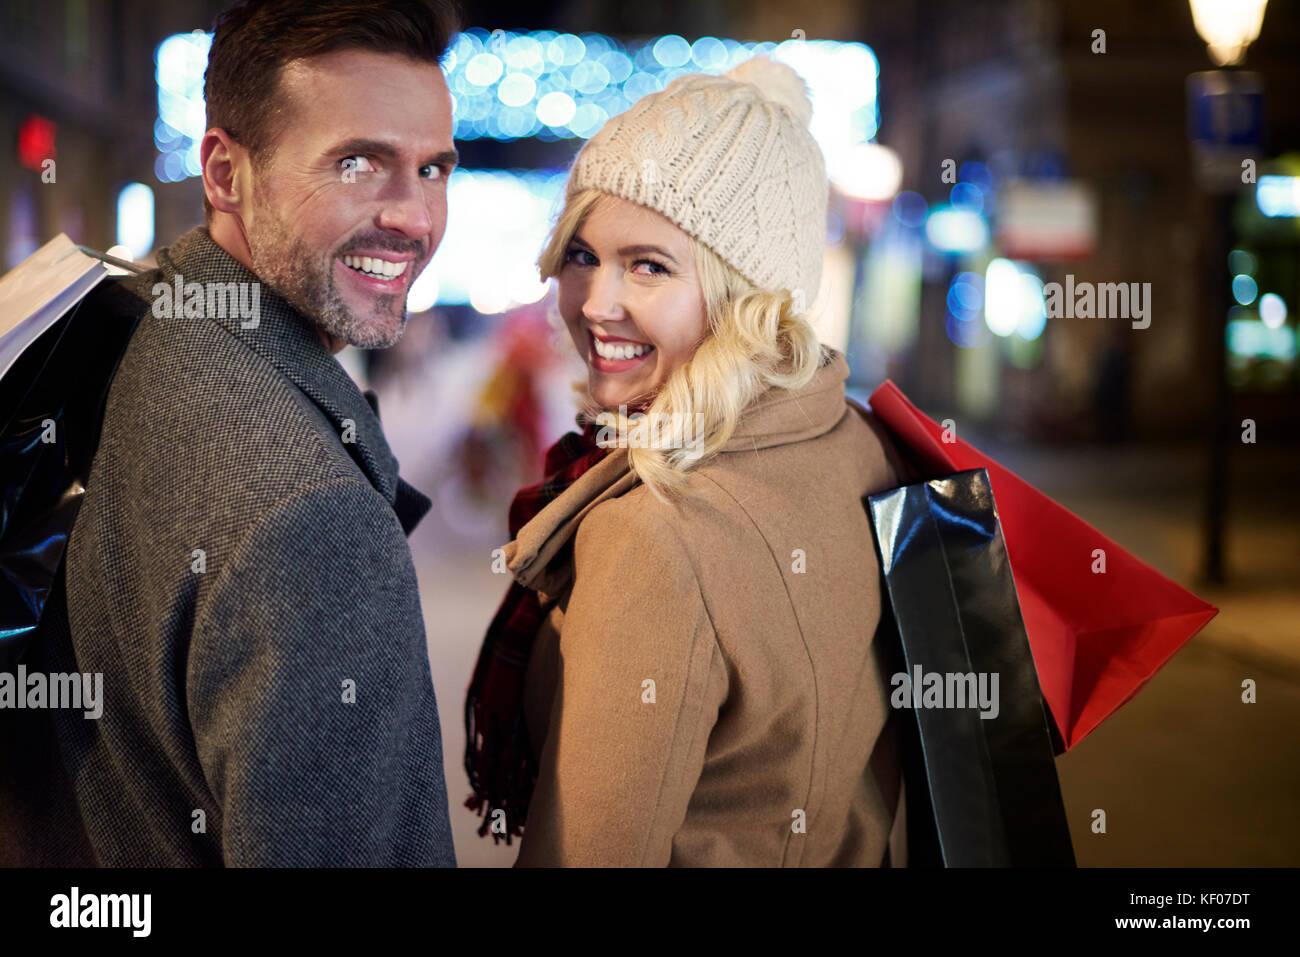 Mature couple preparing for winter season - Stock Image